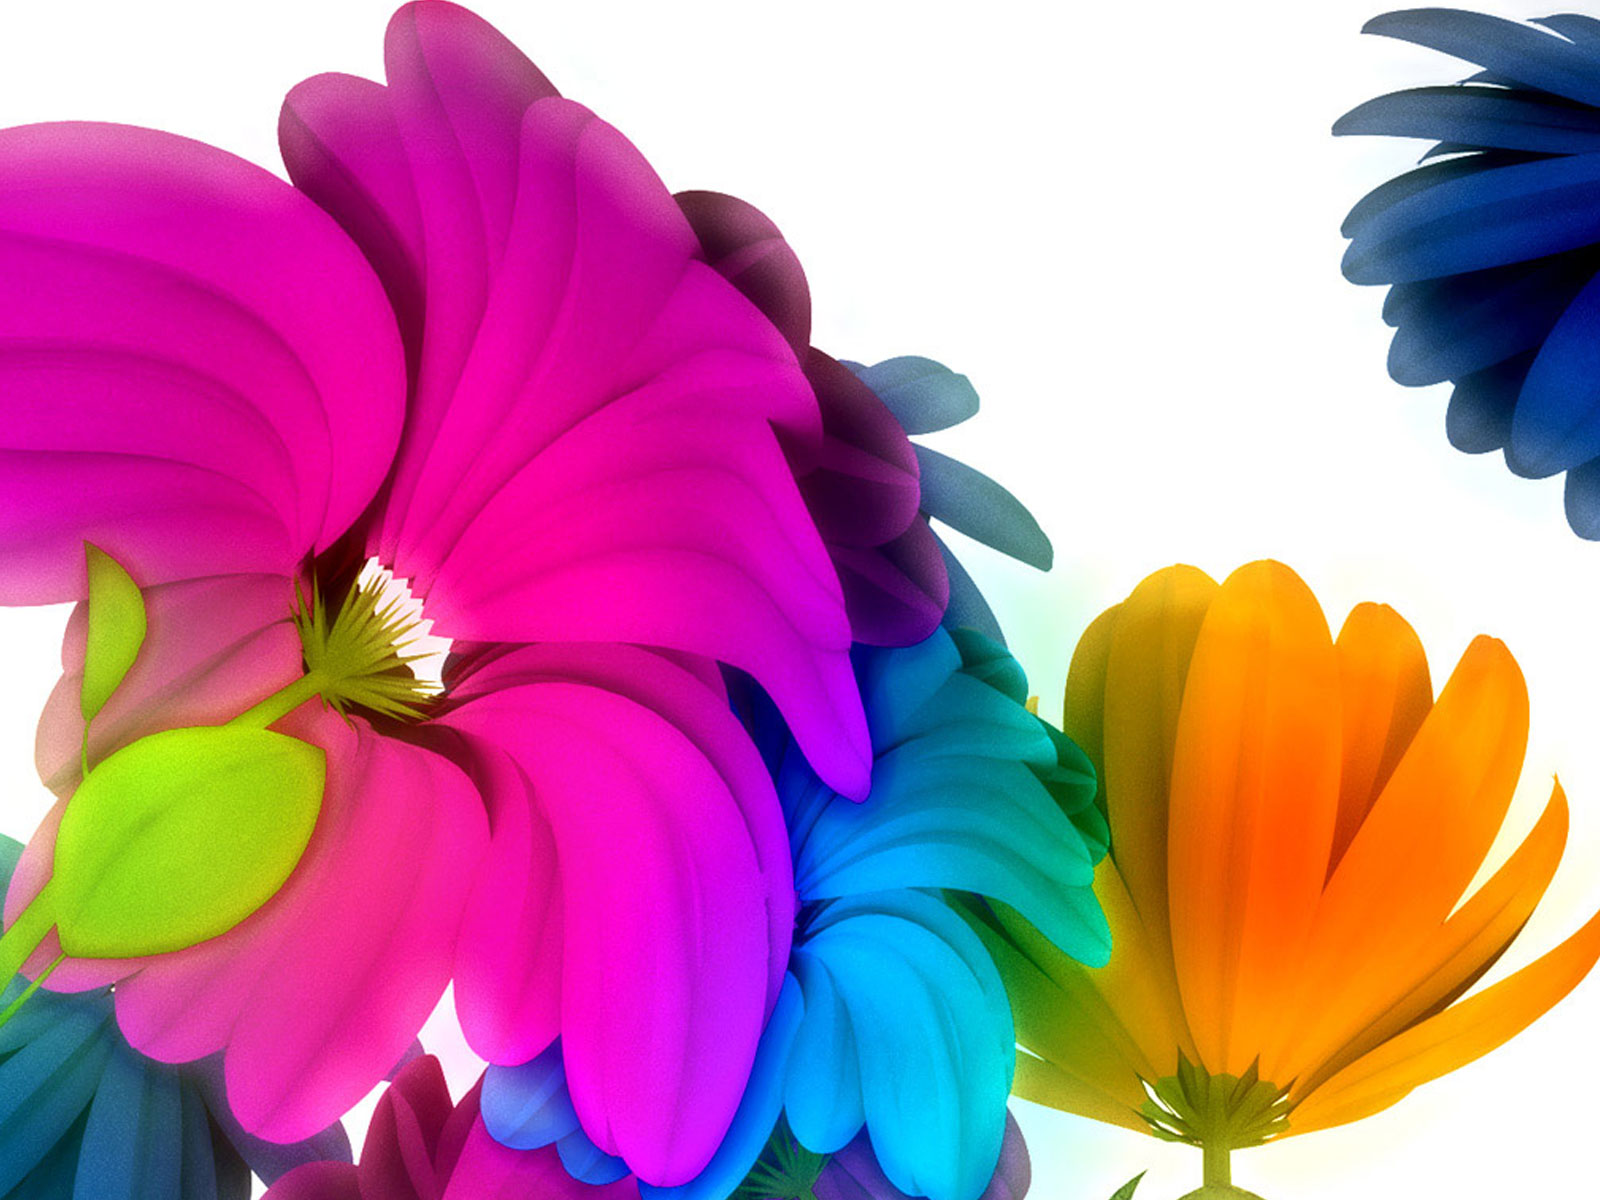 http://1.bp.blogspot.com/-CAuJu5n_k4k/TvNXt1x55xI/AAAAAAAAEDo/MYeWln818Z4/s1600/Music_flowers.jpg